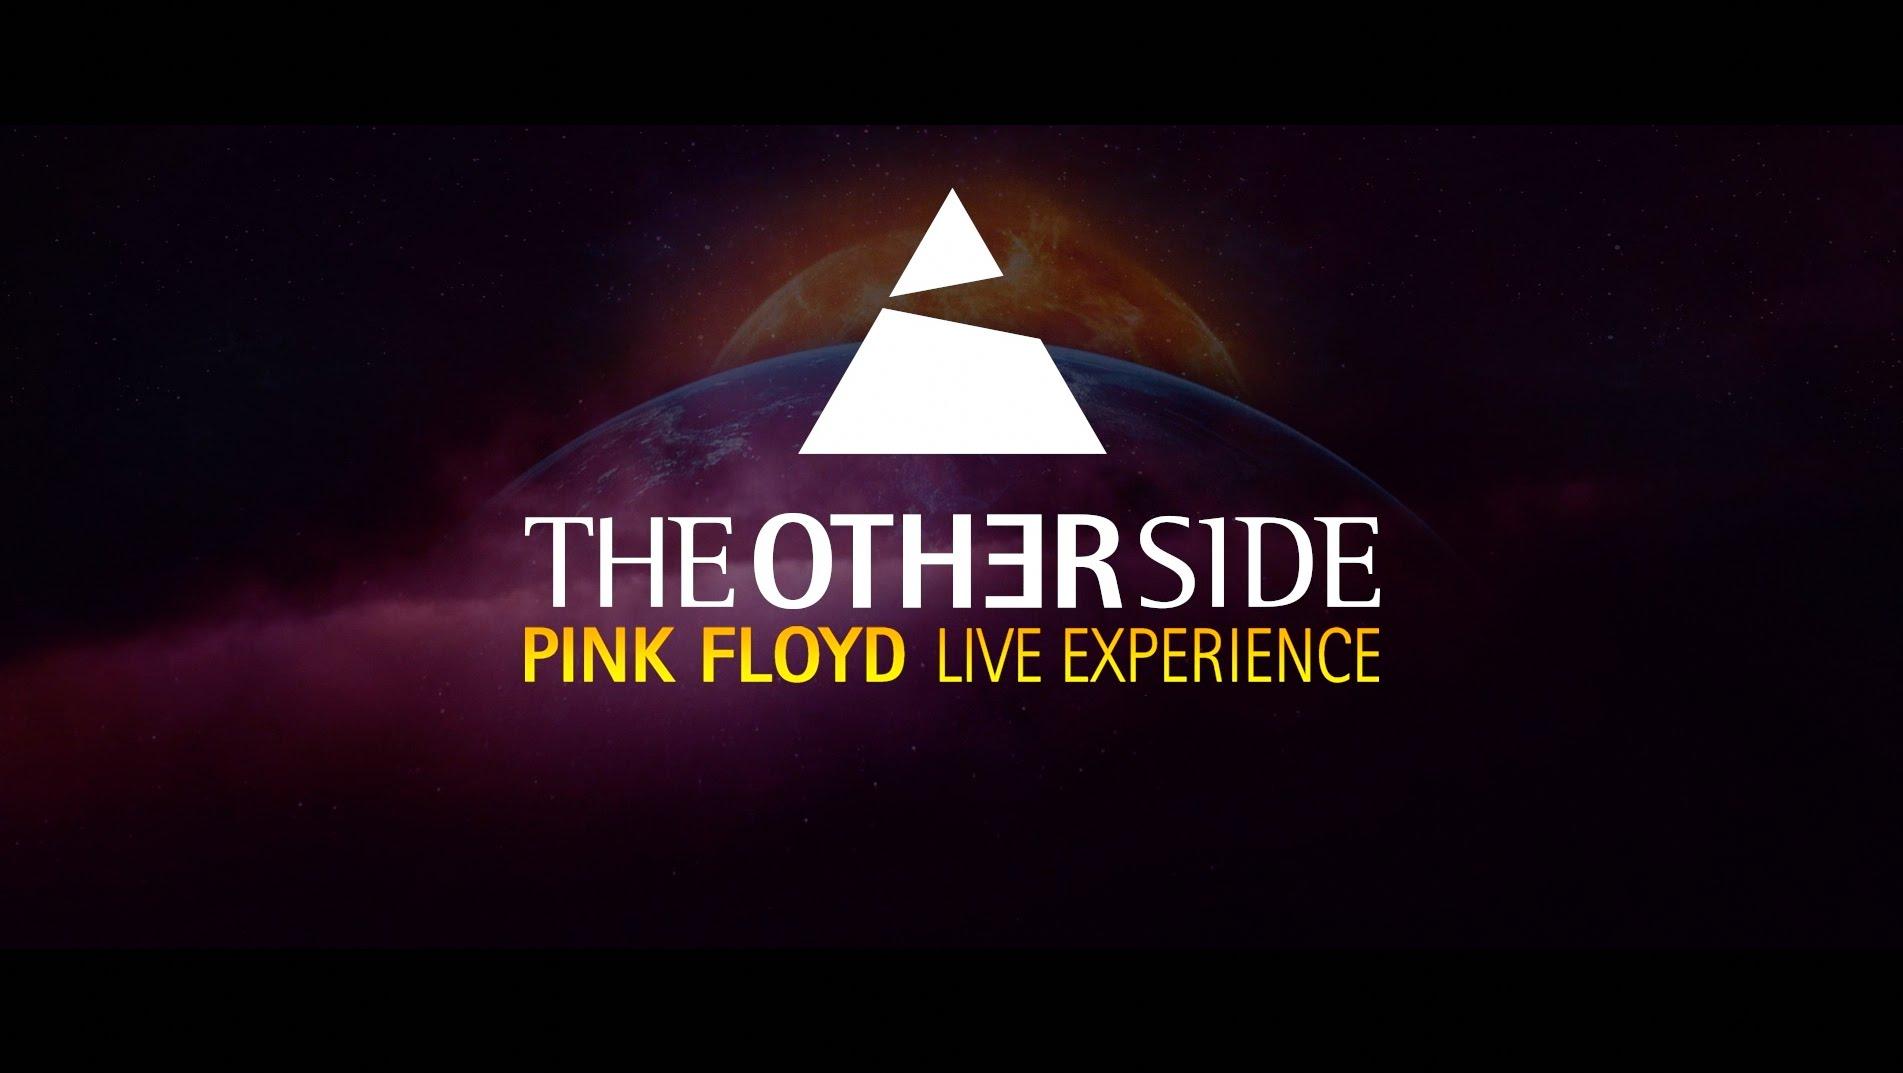 The Other Side sigue rindiendo tributo a Pink Floyd por toda España